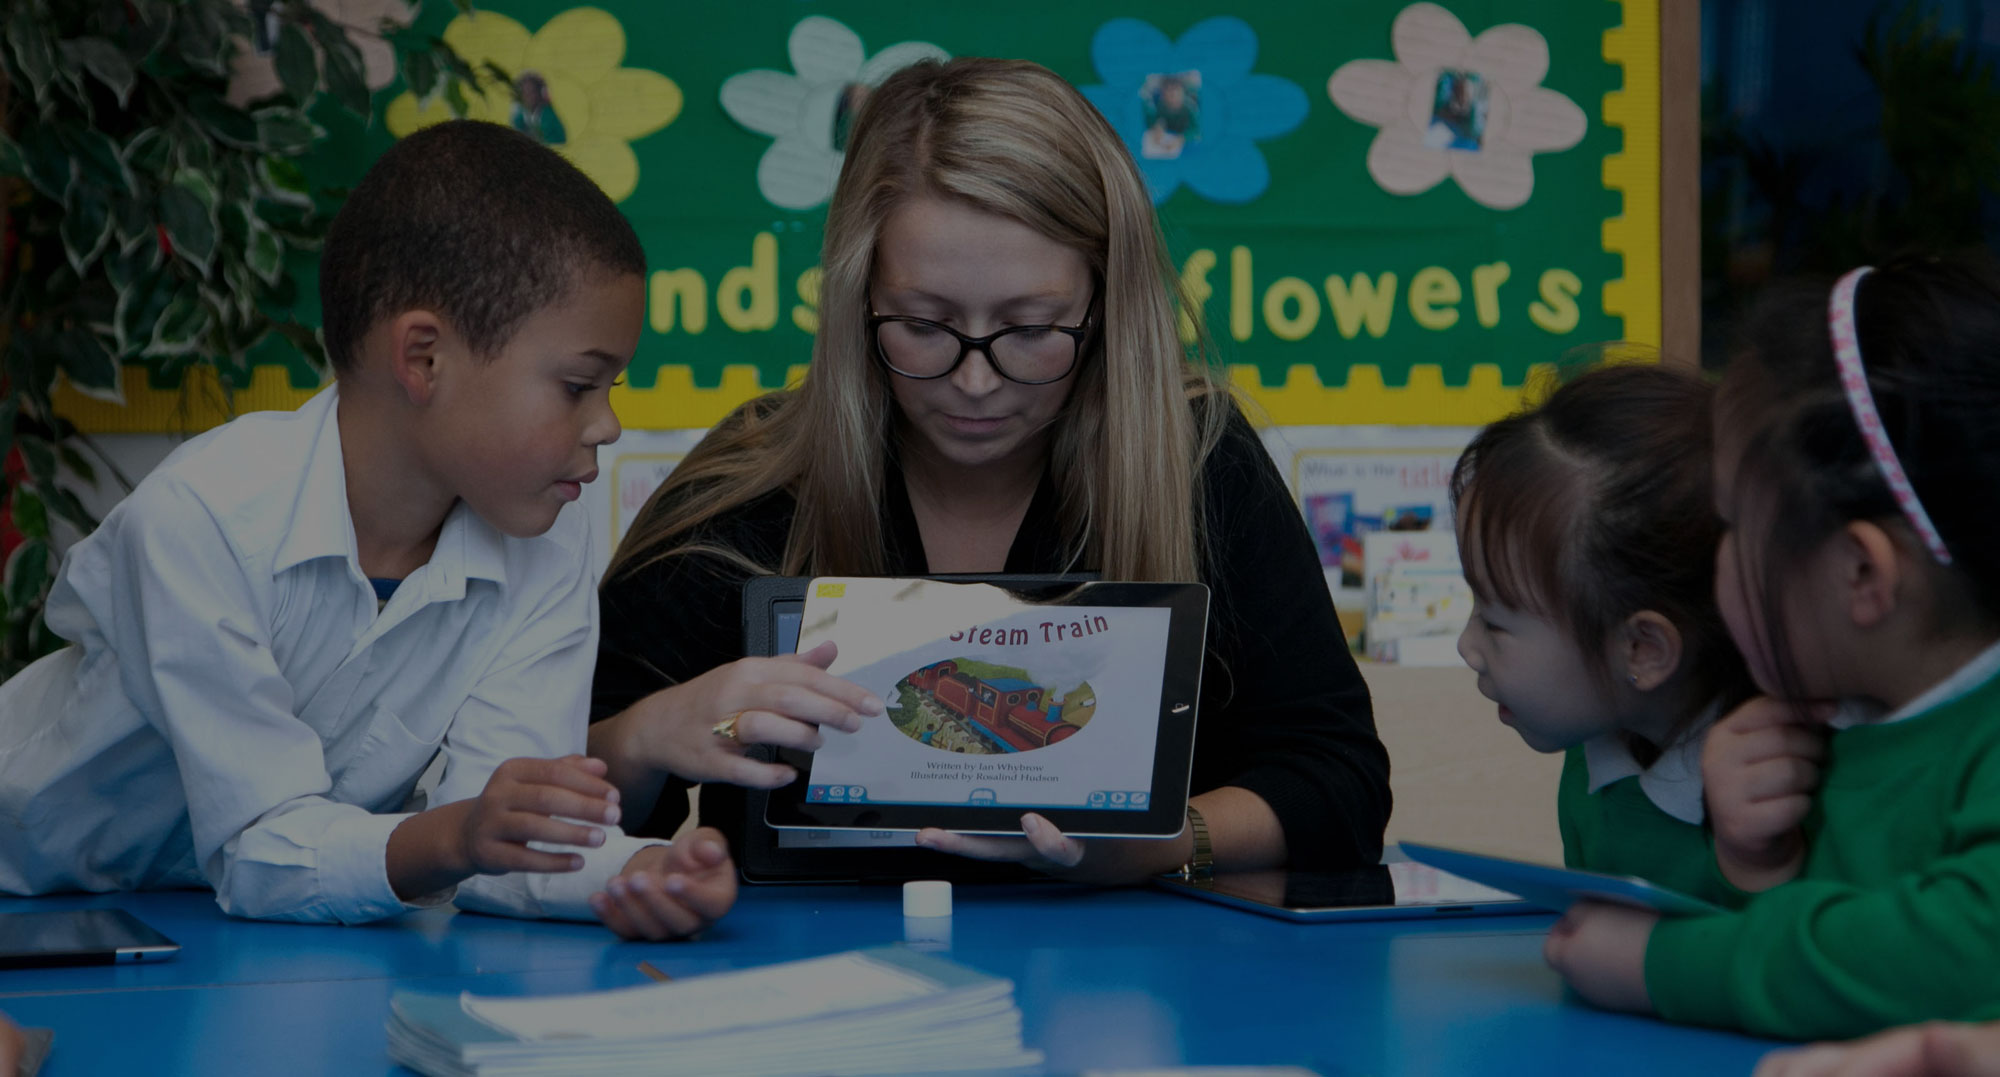 iPads in the classroom: Teachers love them too!